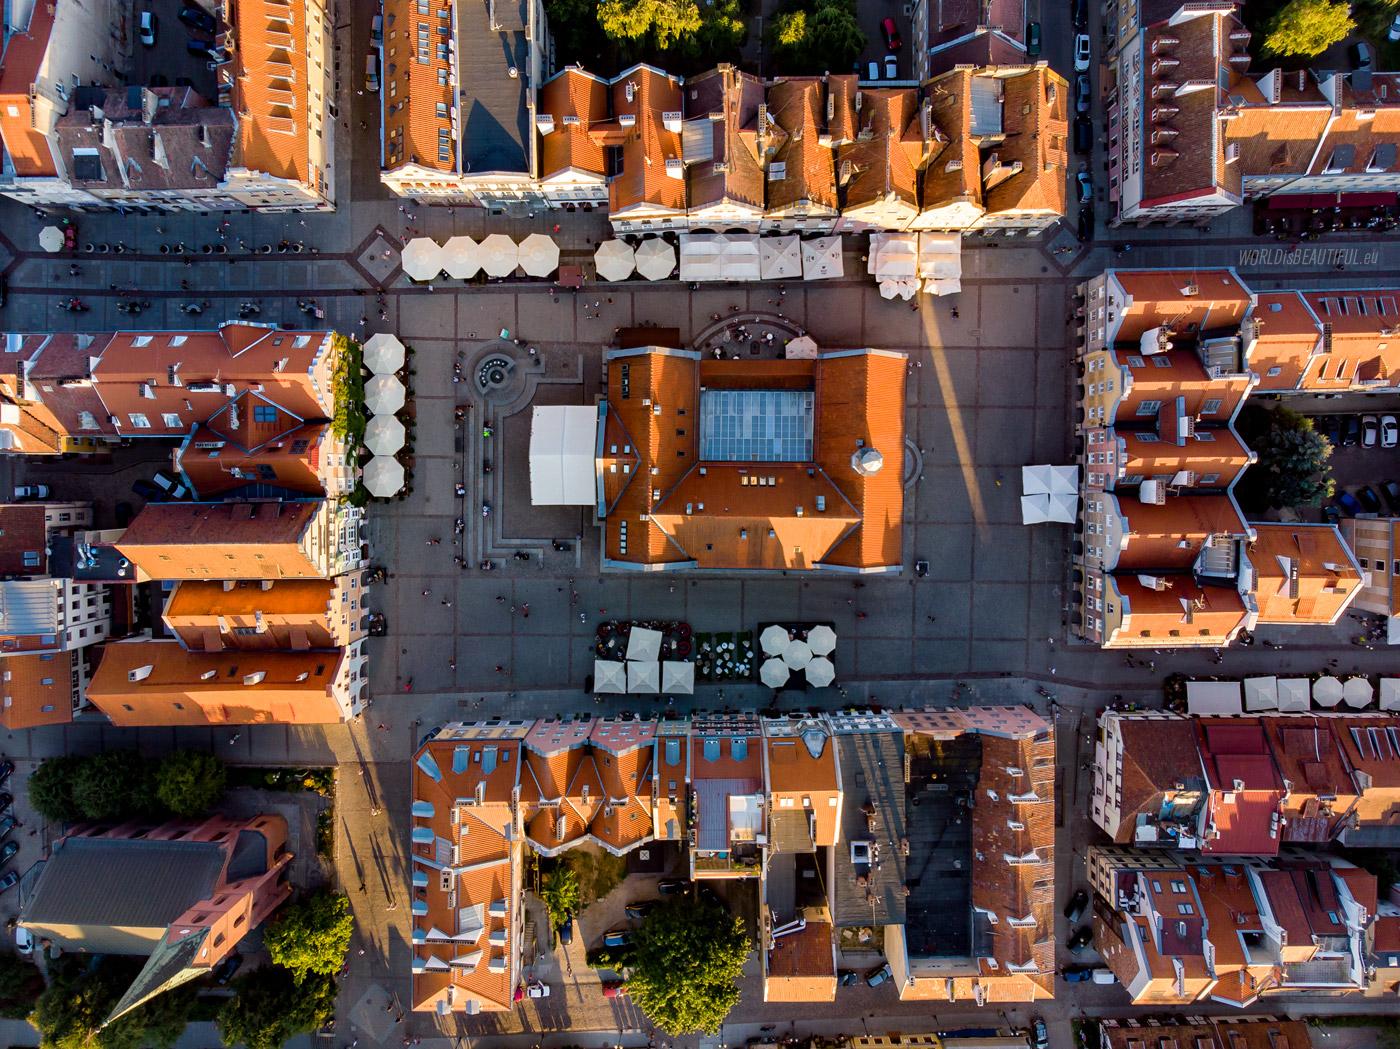 Olsztyn - Old Town